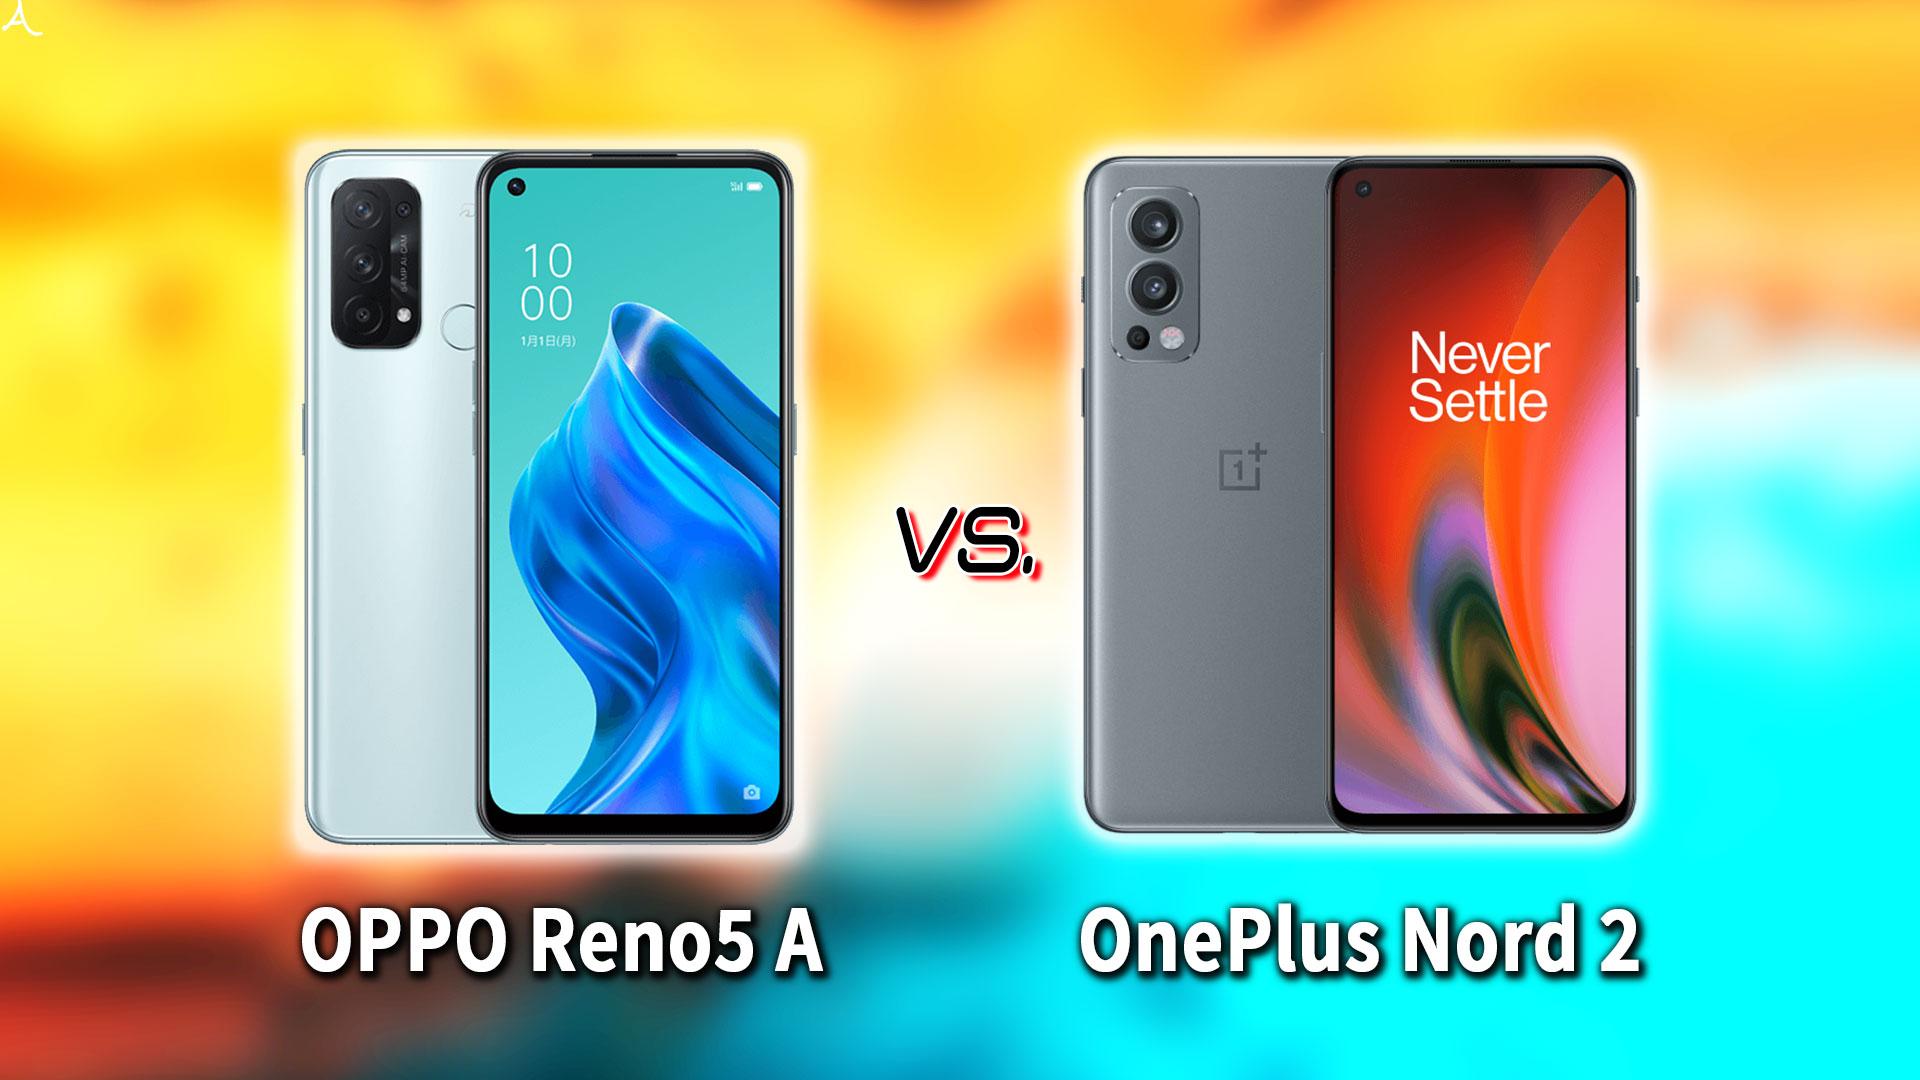 「OPPO Reno5 A」と「OnePlus Nord 2」の違いを比較:どっちを買う?